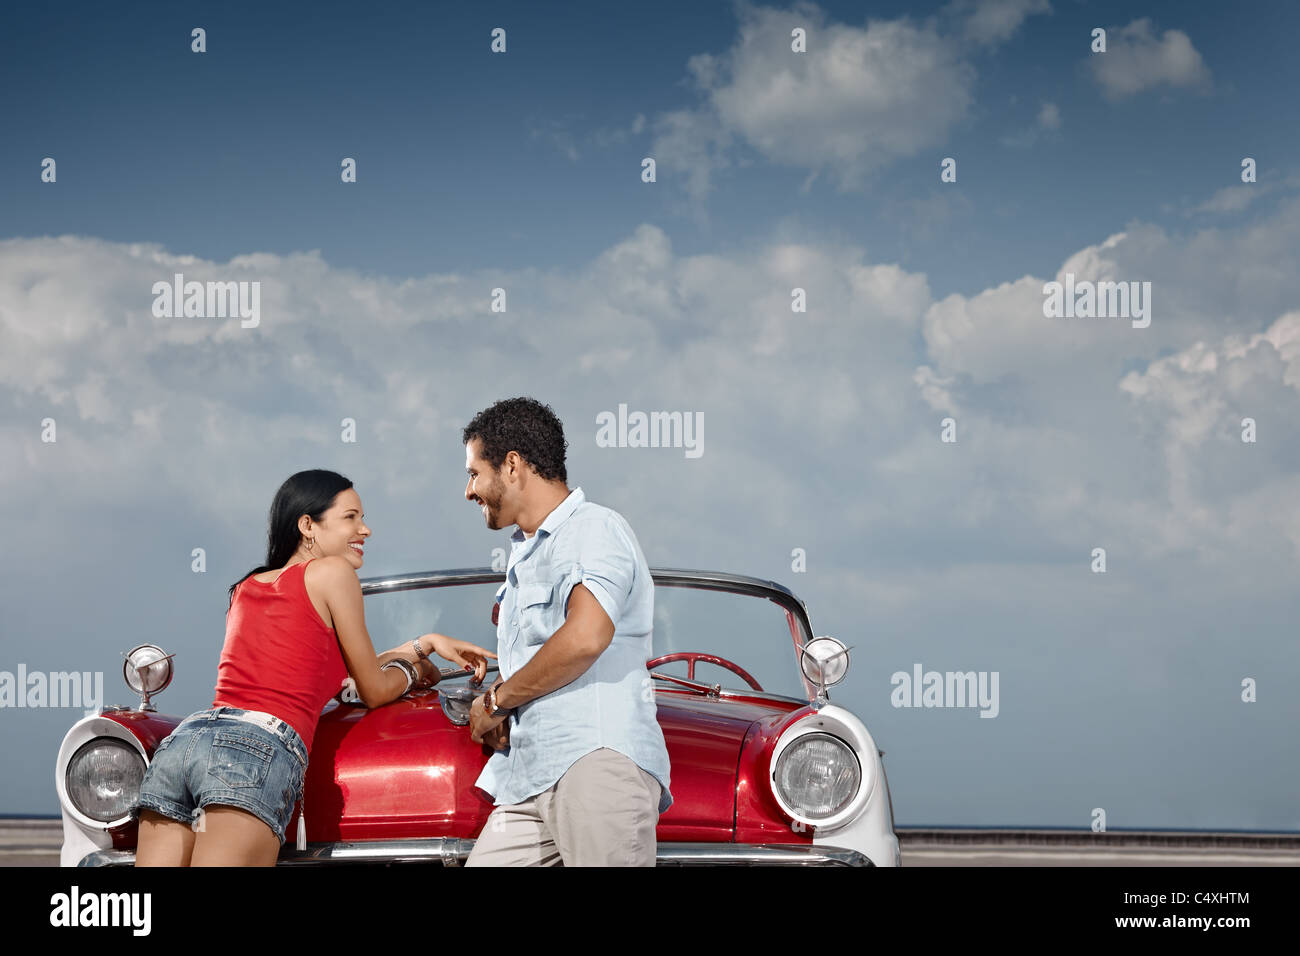 hispanic boyfriend and girlfriend standing near vintage car in havana, cuba. Horizontal shape, side view, copy space - Stock Image